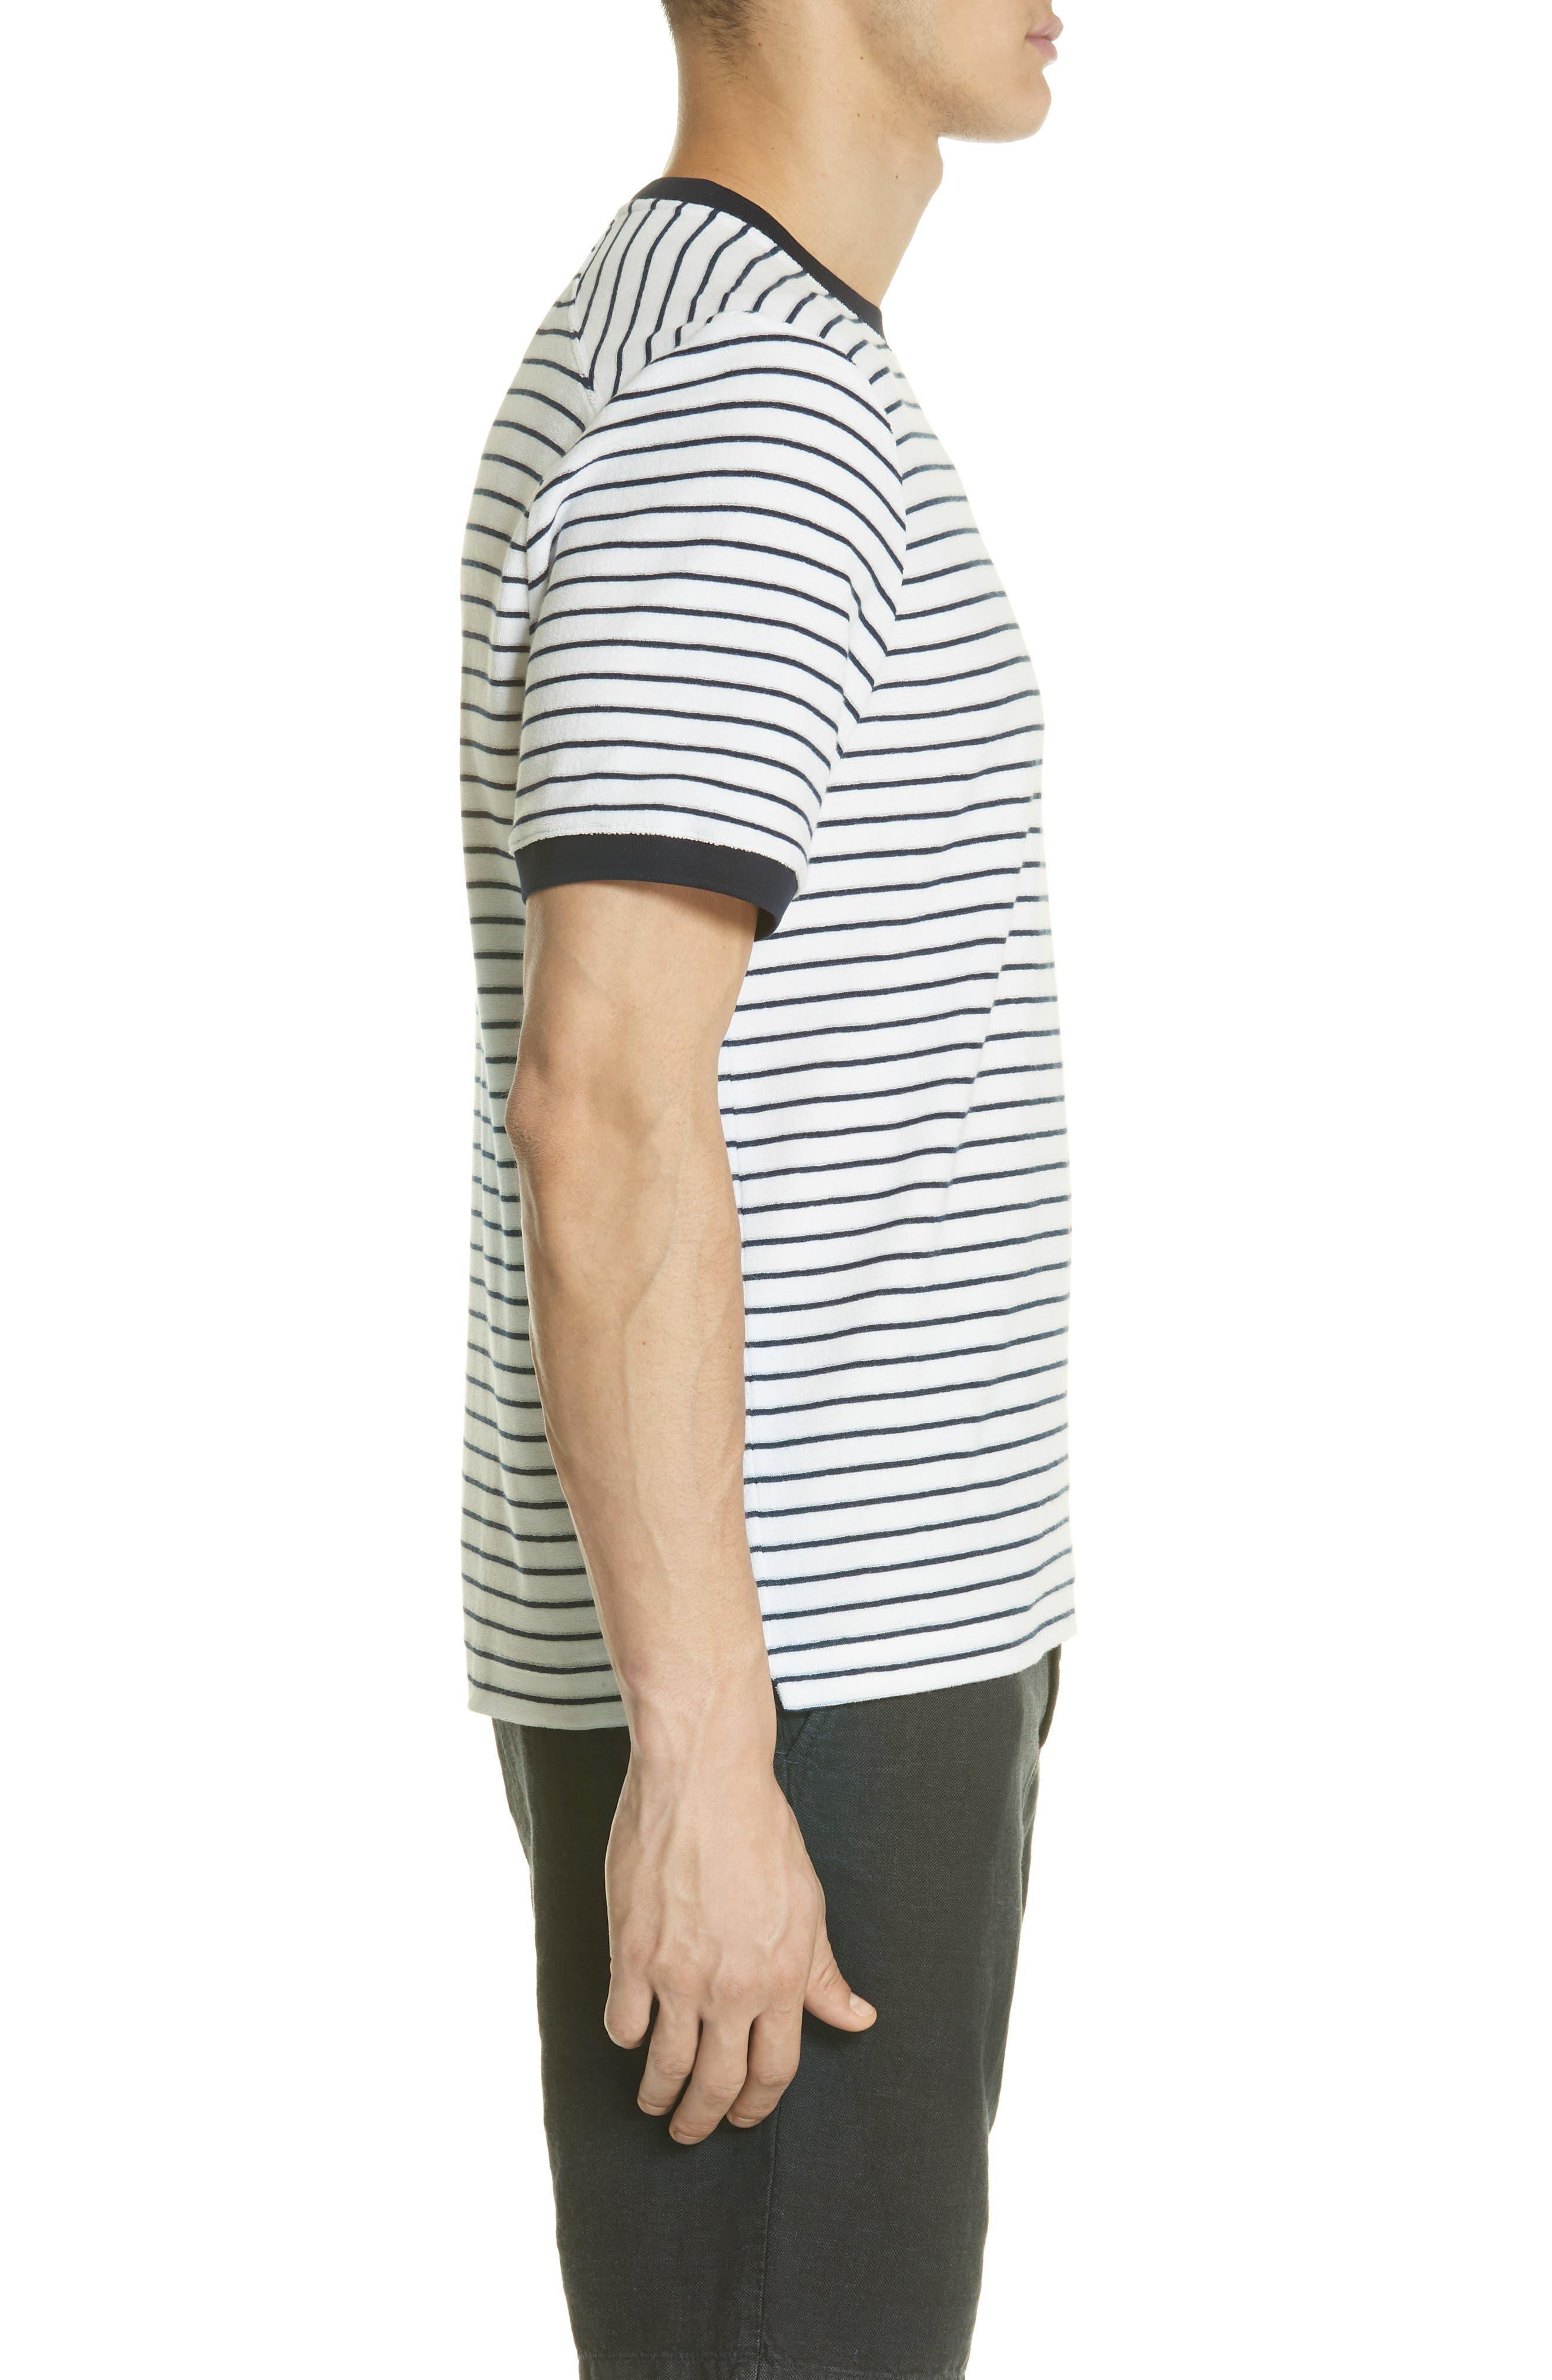 VILEBREQUIN, Stripe Terry T-Shirt, Alternate thumbnail 3, color, 402